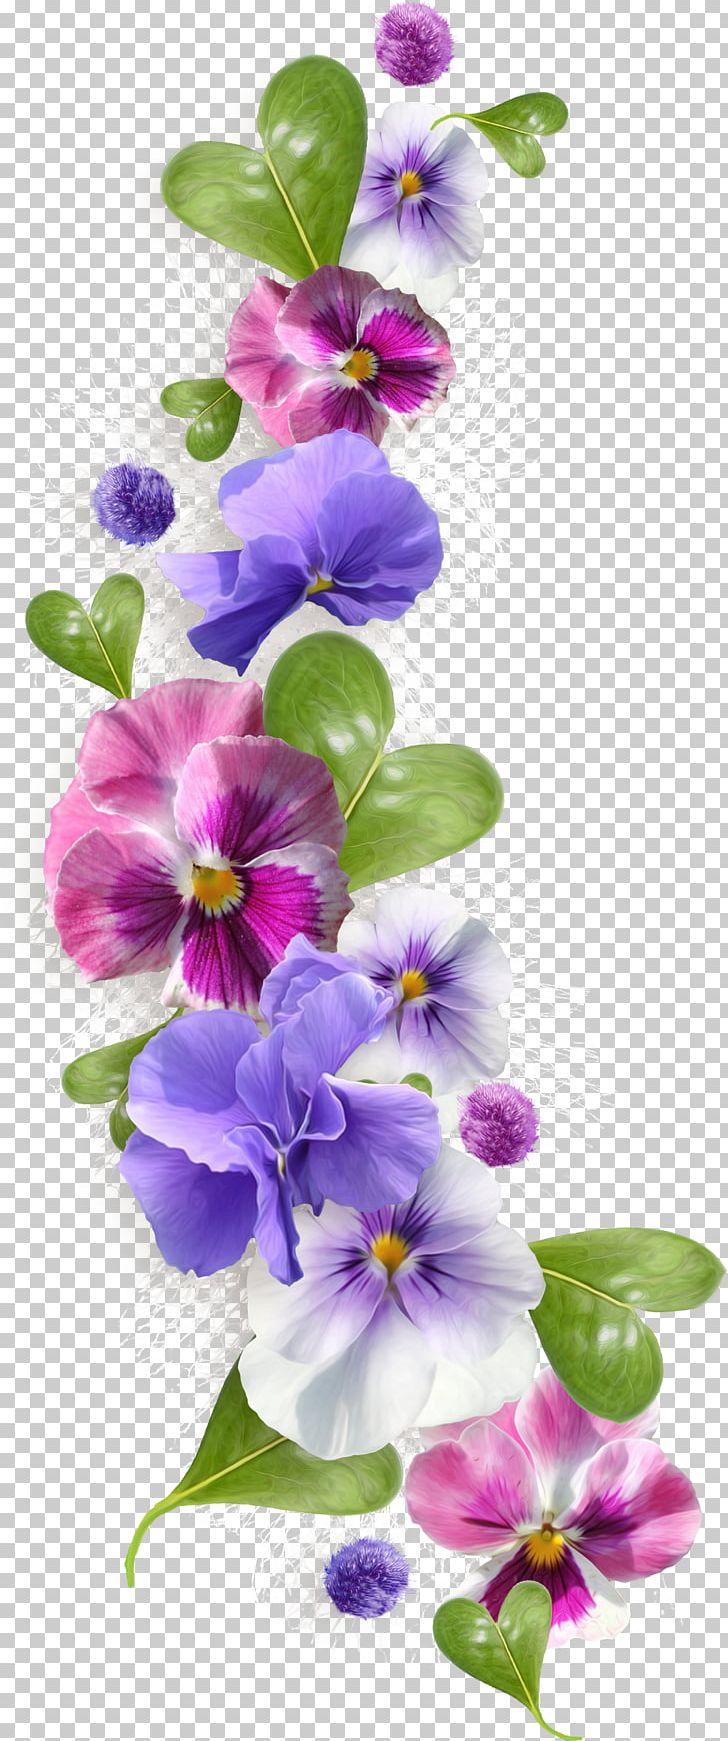 Sweet Violet Pansy African Violets PNG, Clipart, African Violets.